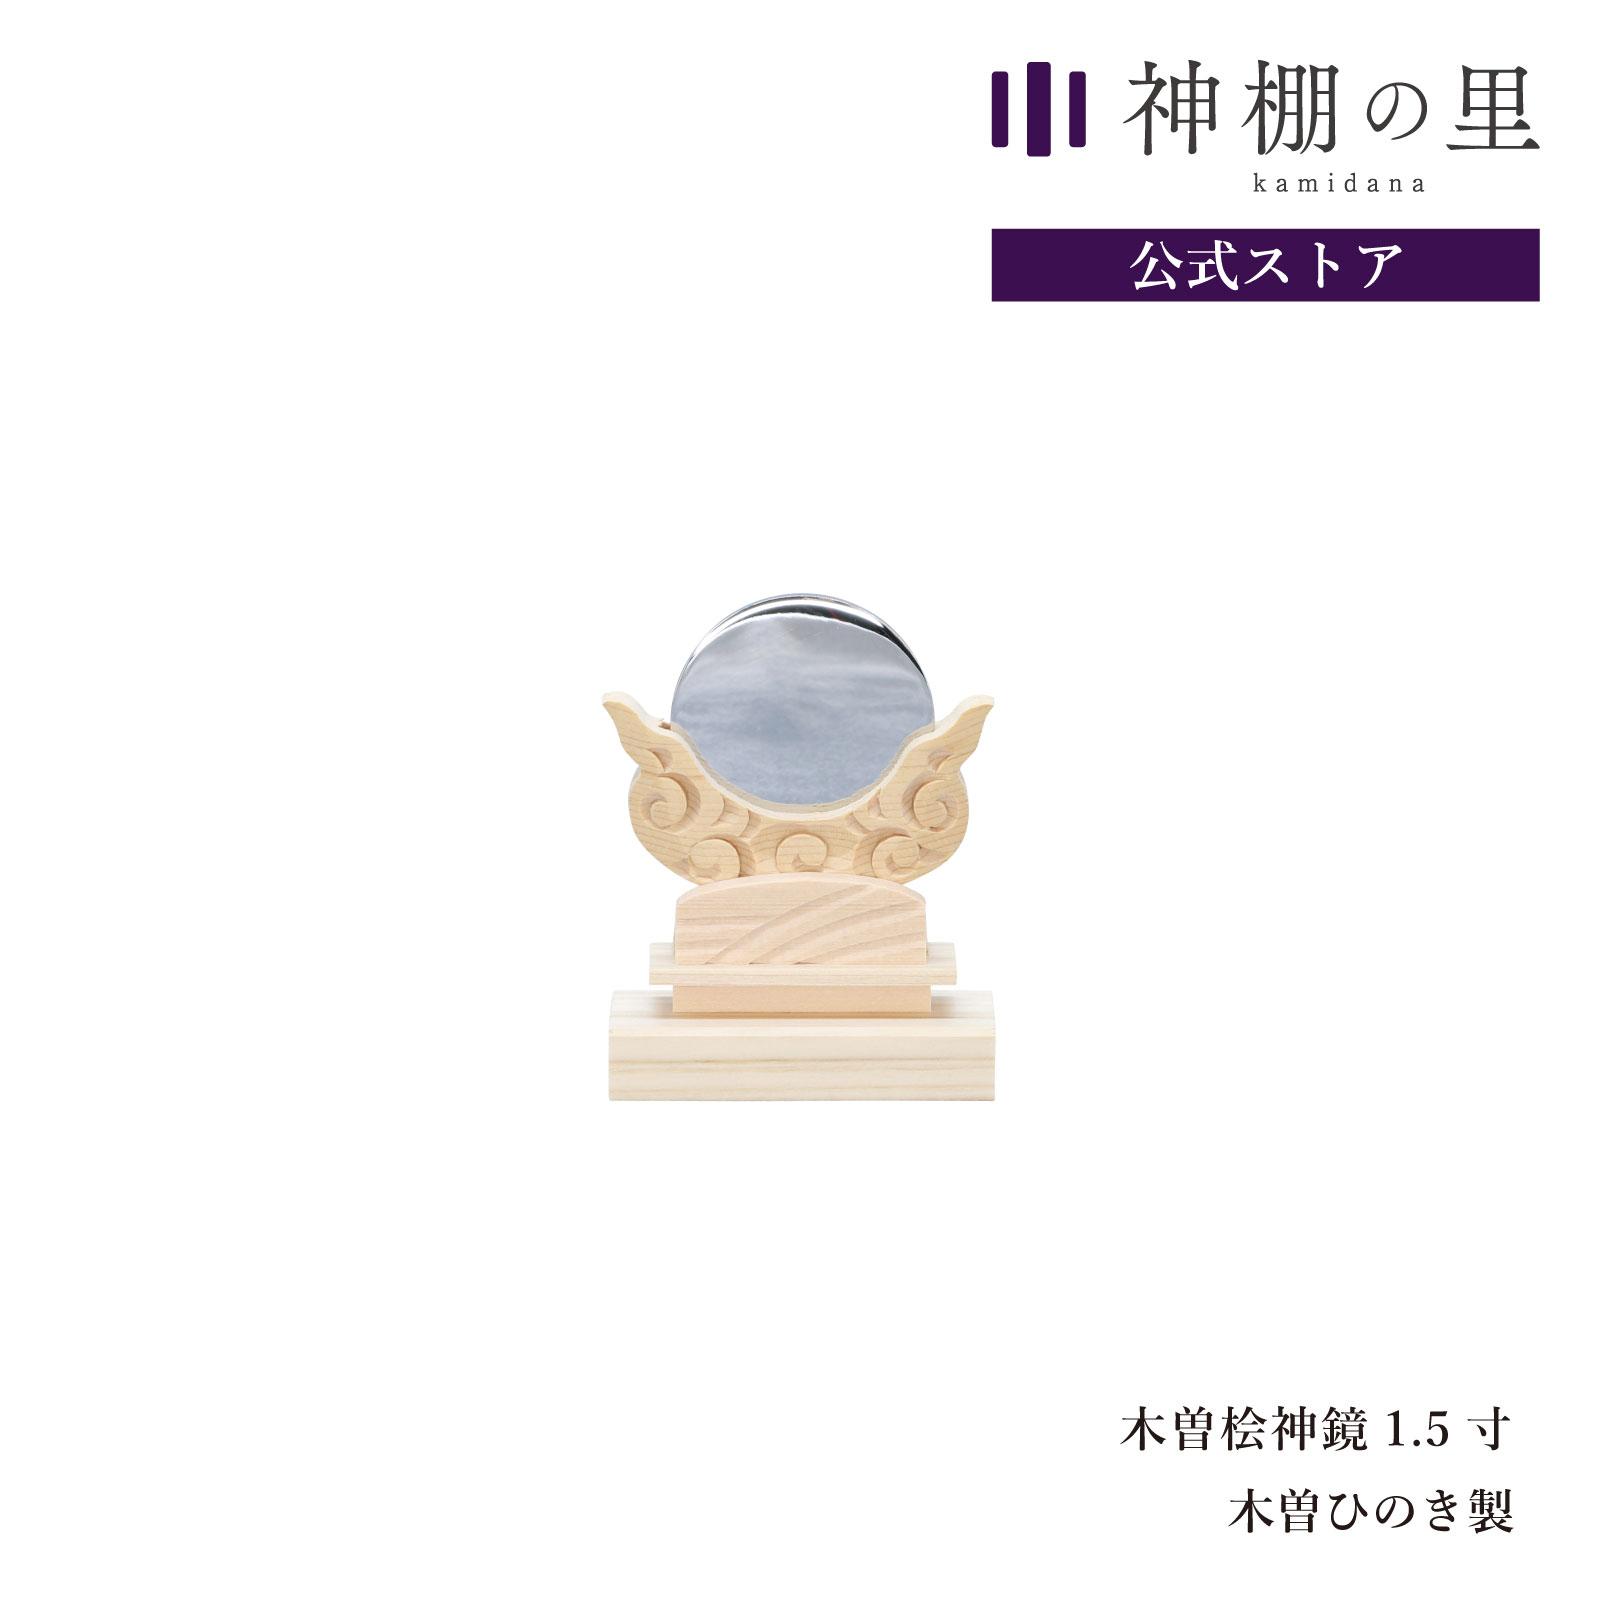 価格 日本製 職人彫り 本鏡使用 神棚の里 公式 『4年保証』 木曽桧 神鏡1.5寸 RSL 神鏡 木曽ひのき